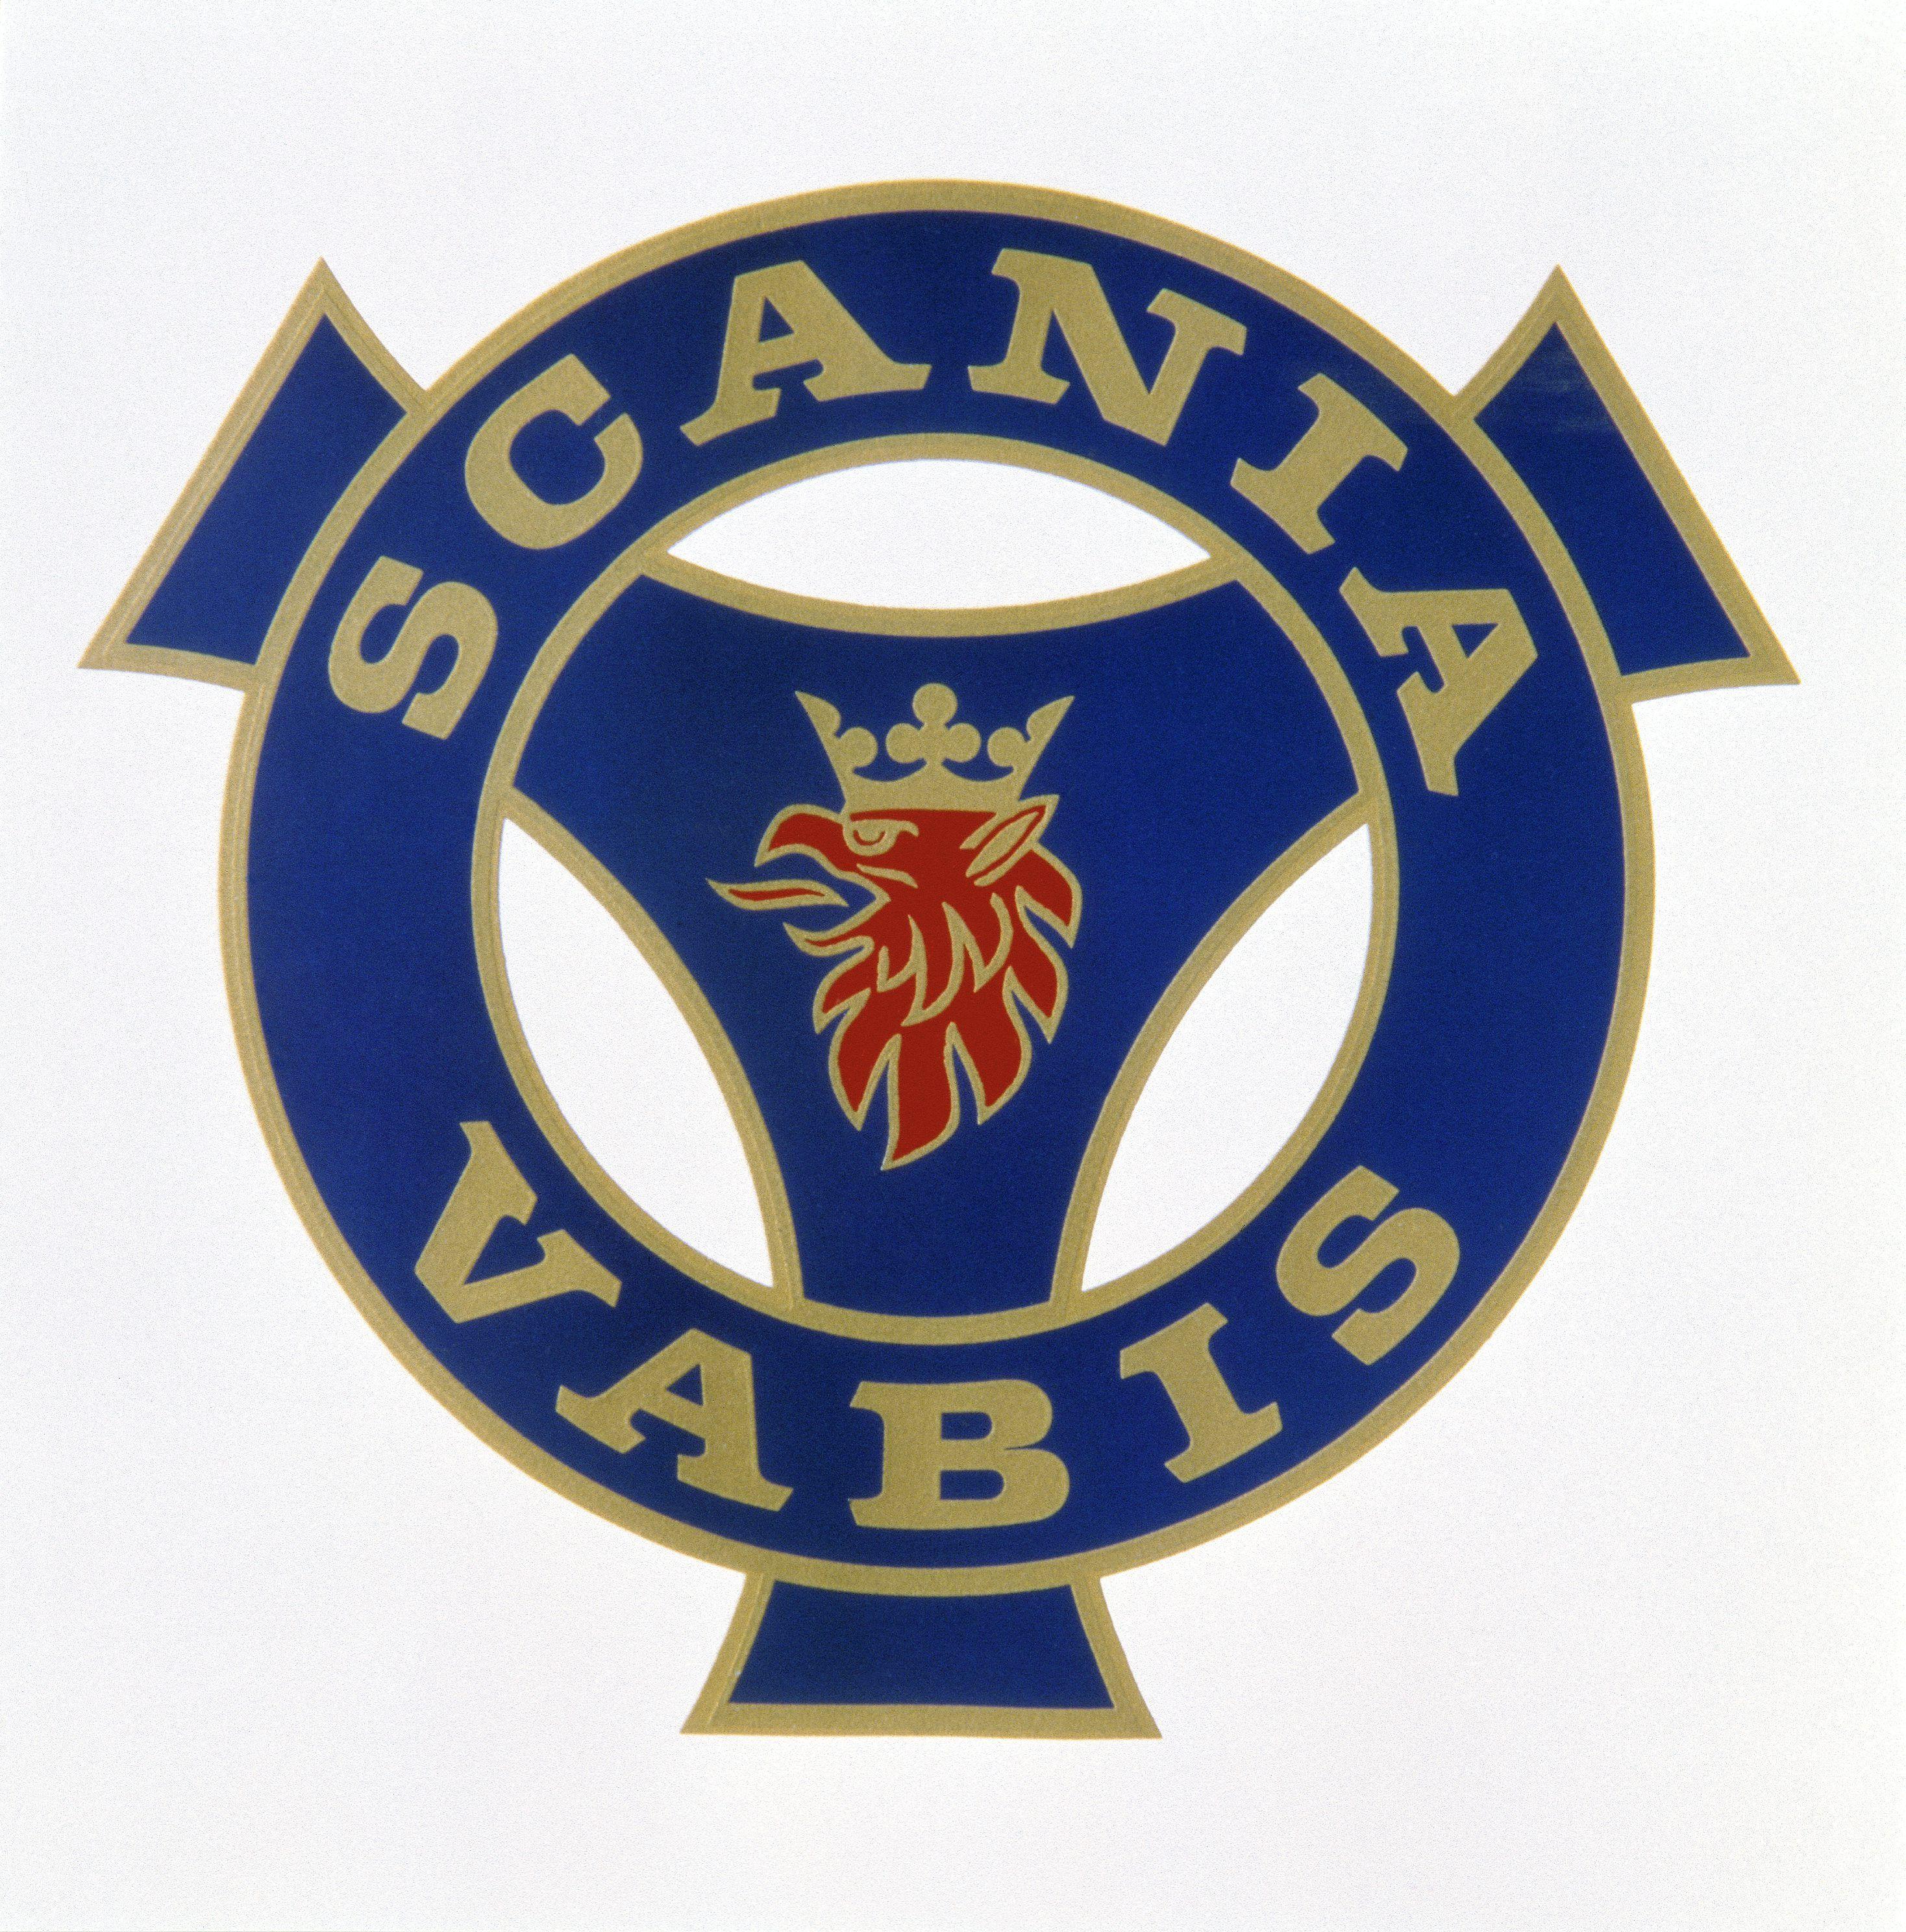 Scania logo SAAB SCANIA CARS AND TRUCKS SWEDEN